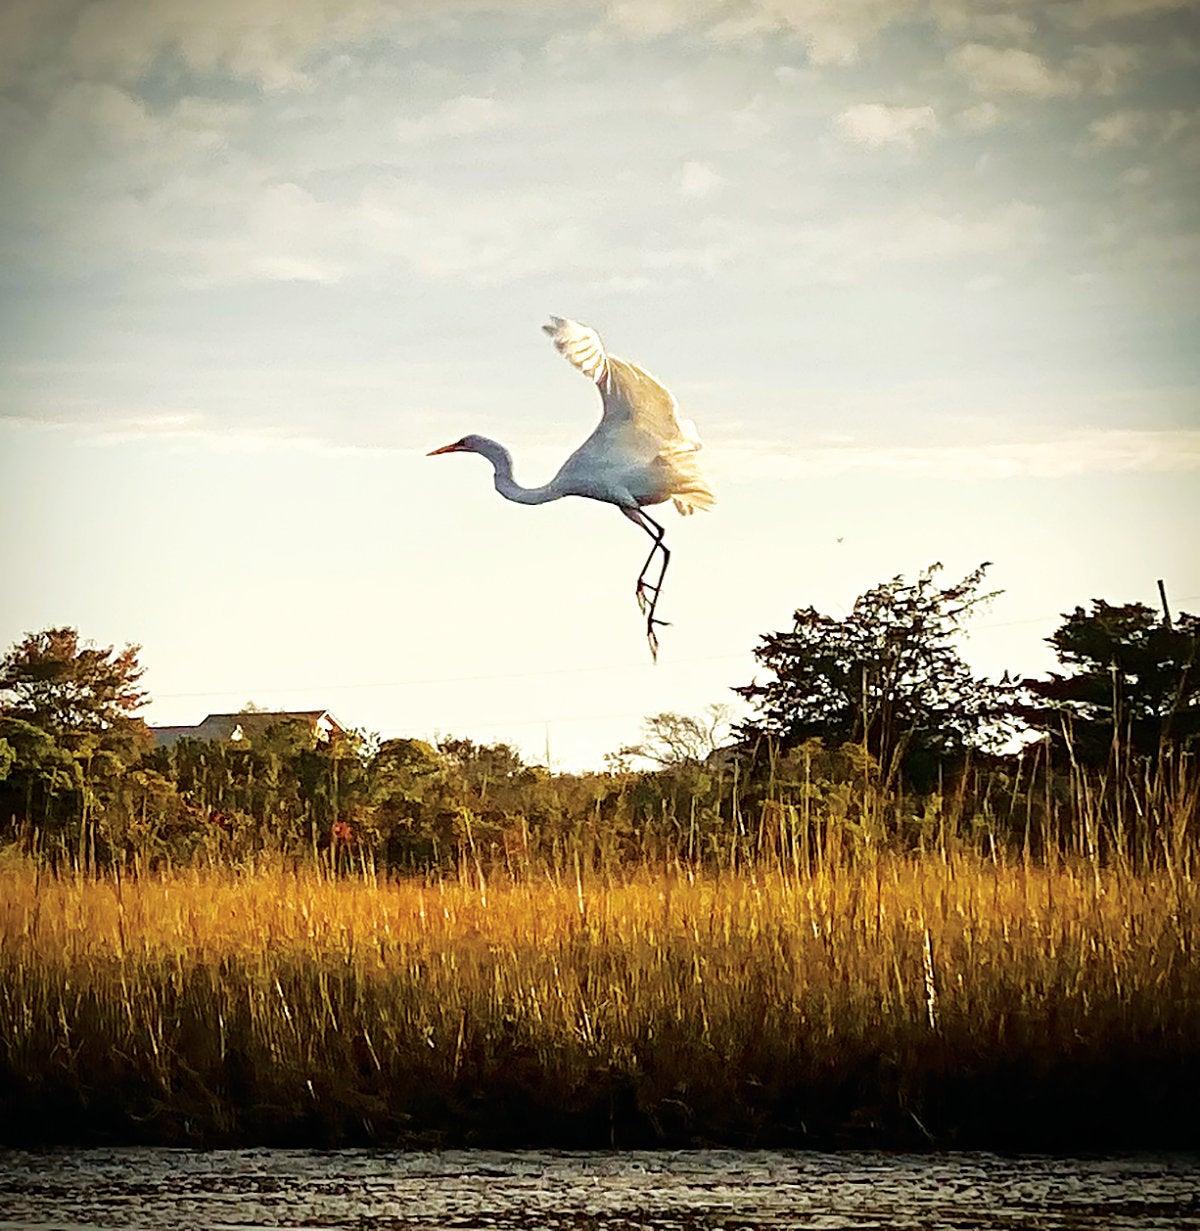 An egret in flight seen from Ninigret Pond in Charlestown, R.I.